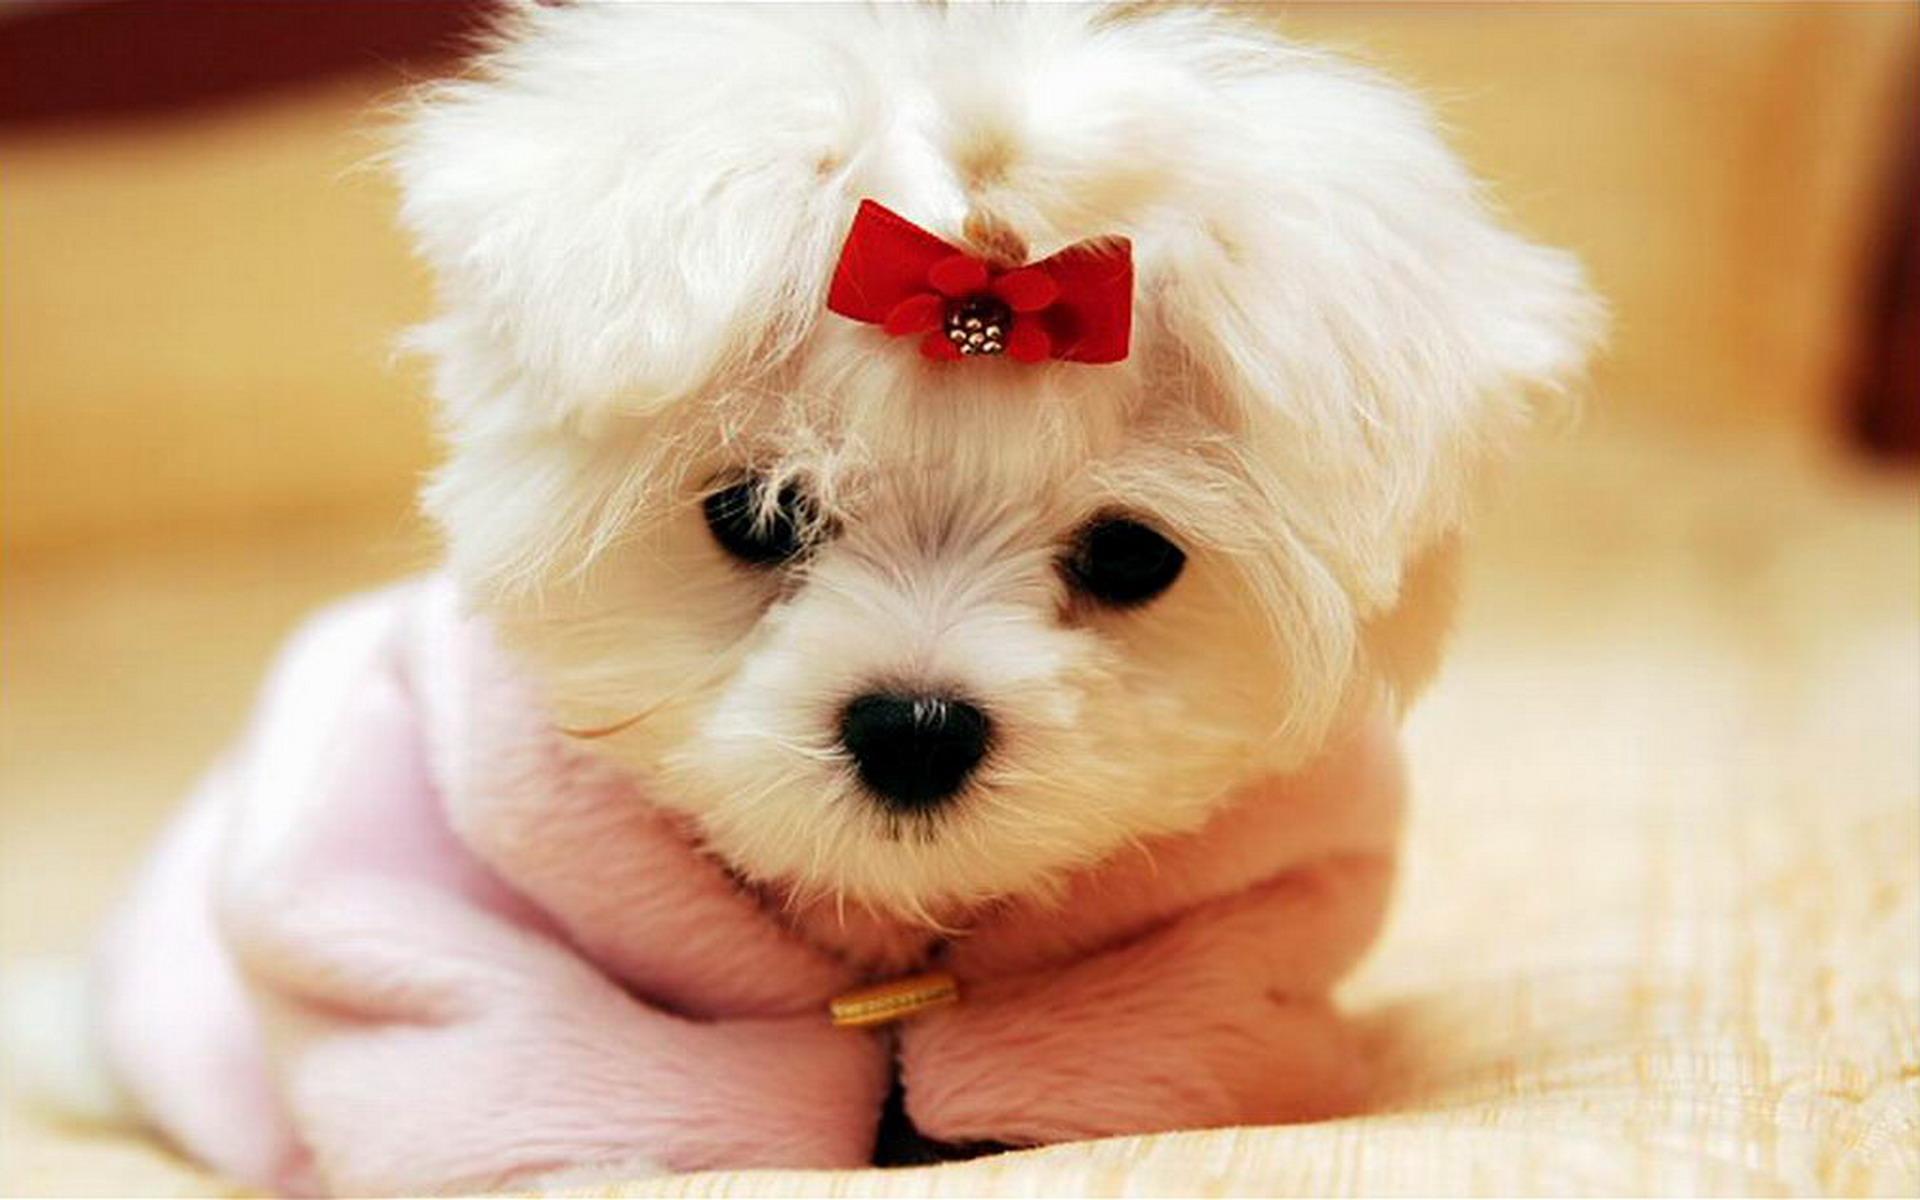 Cute White Rabbit Wallpapers For Desktop Cute Baby Animal Wallpapers Pixelstalk Net